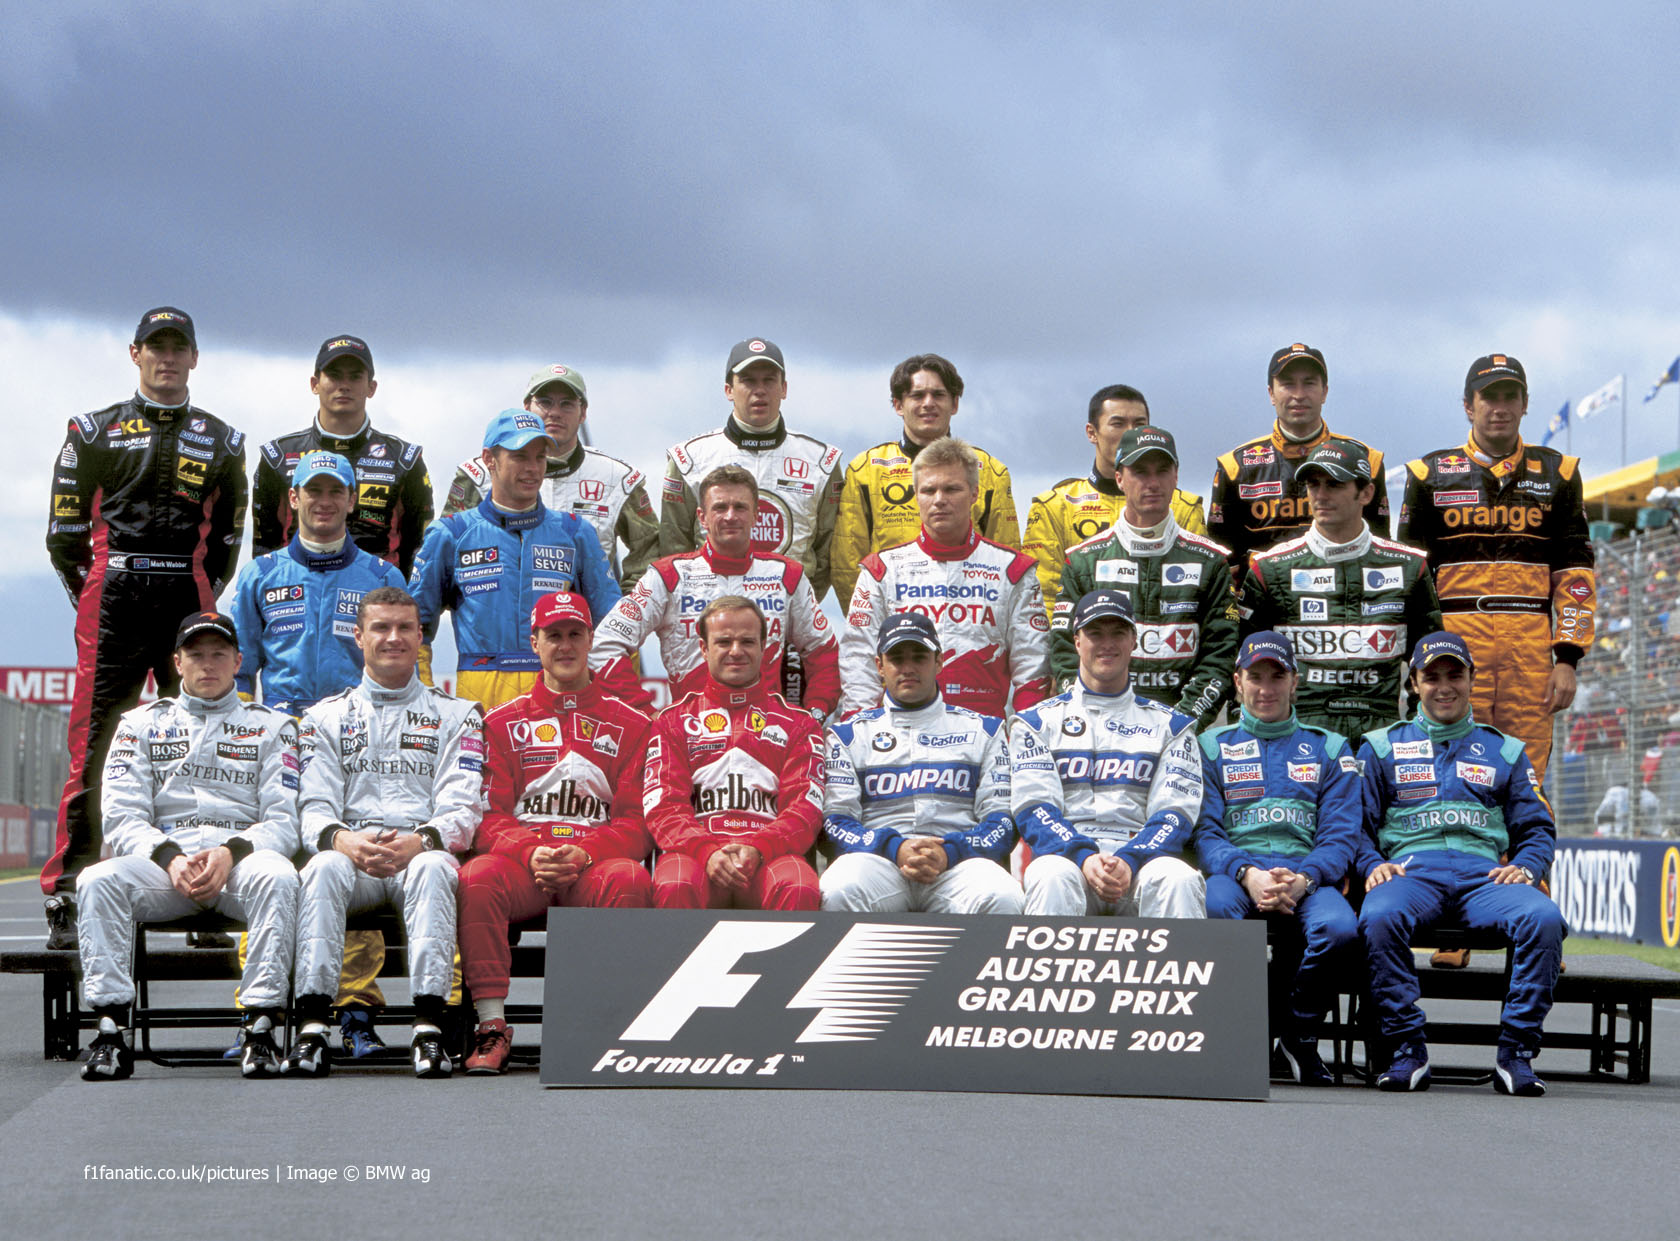 Drivers, Melbourne, 2002